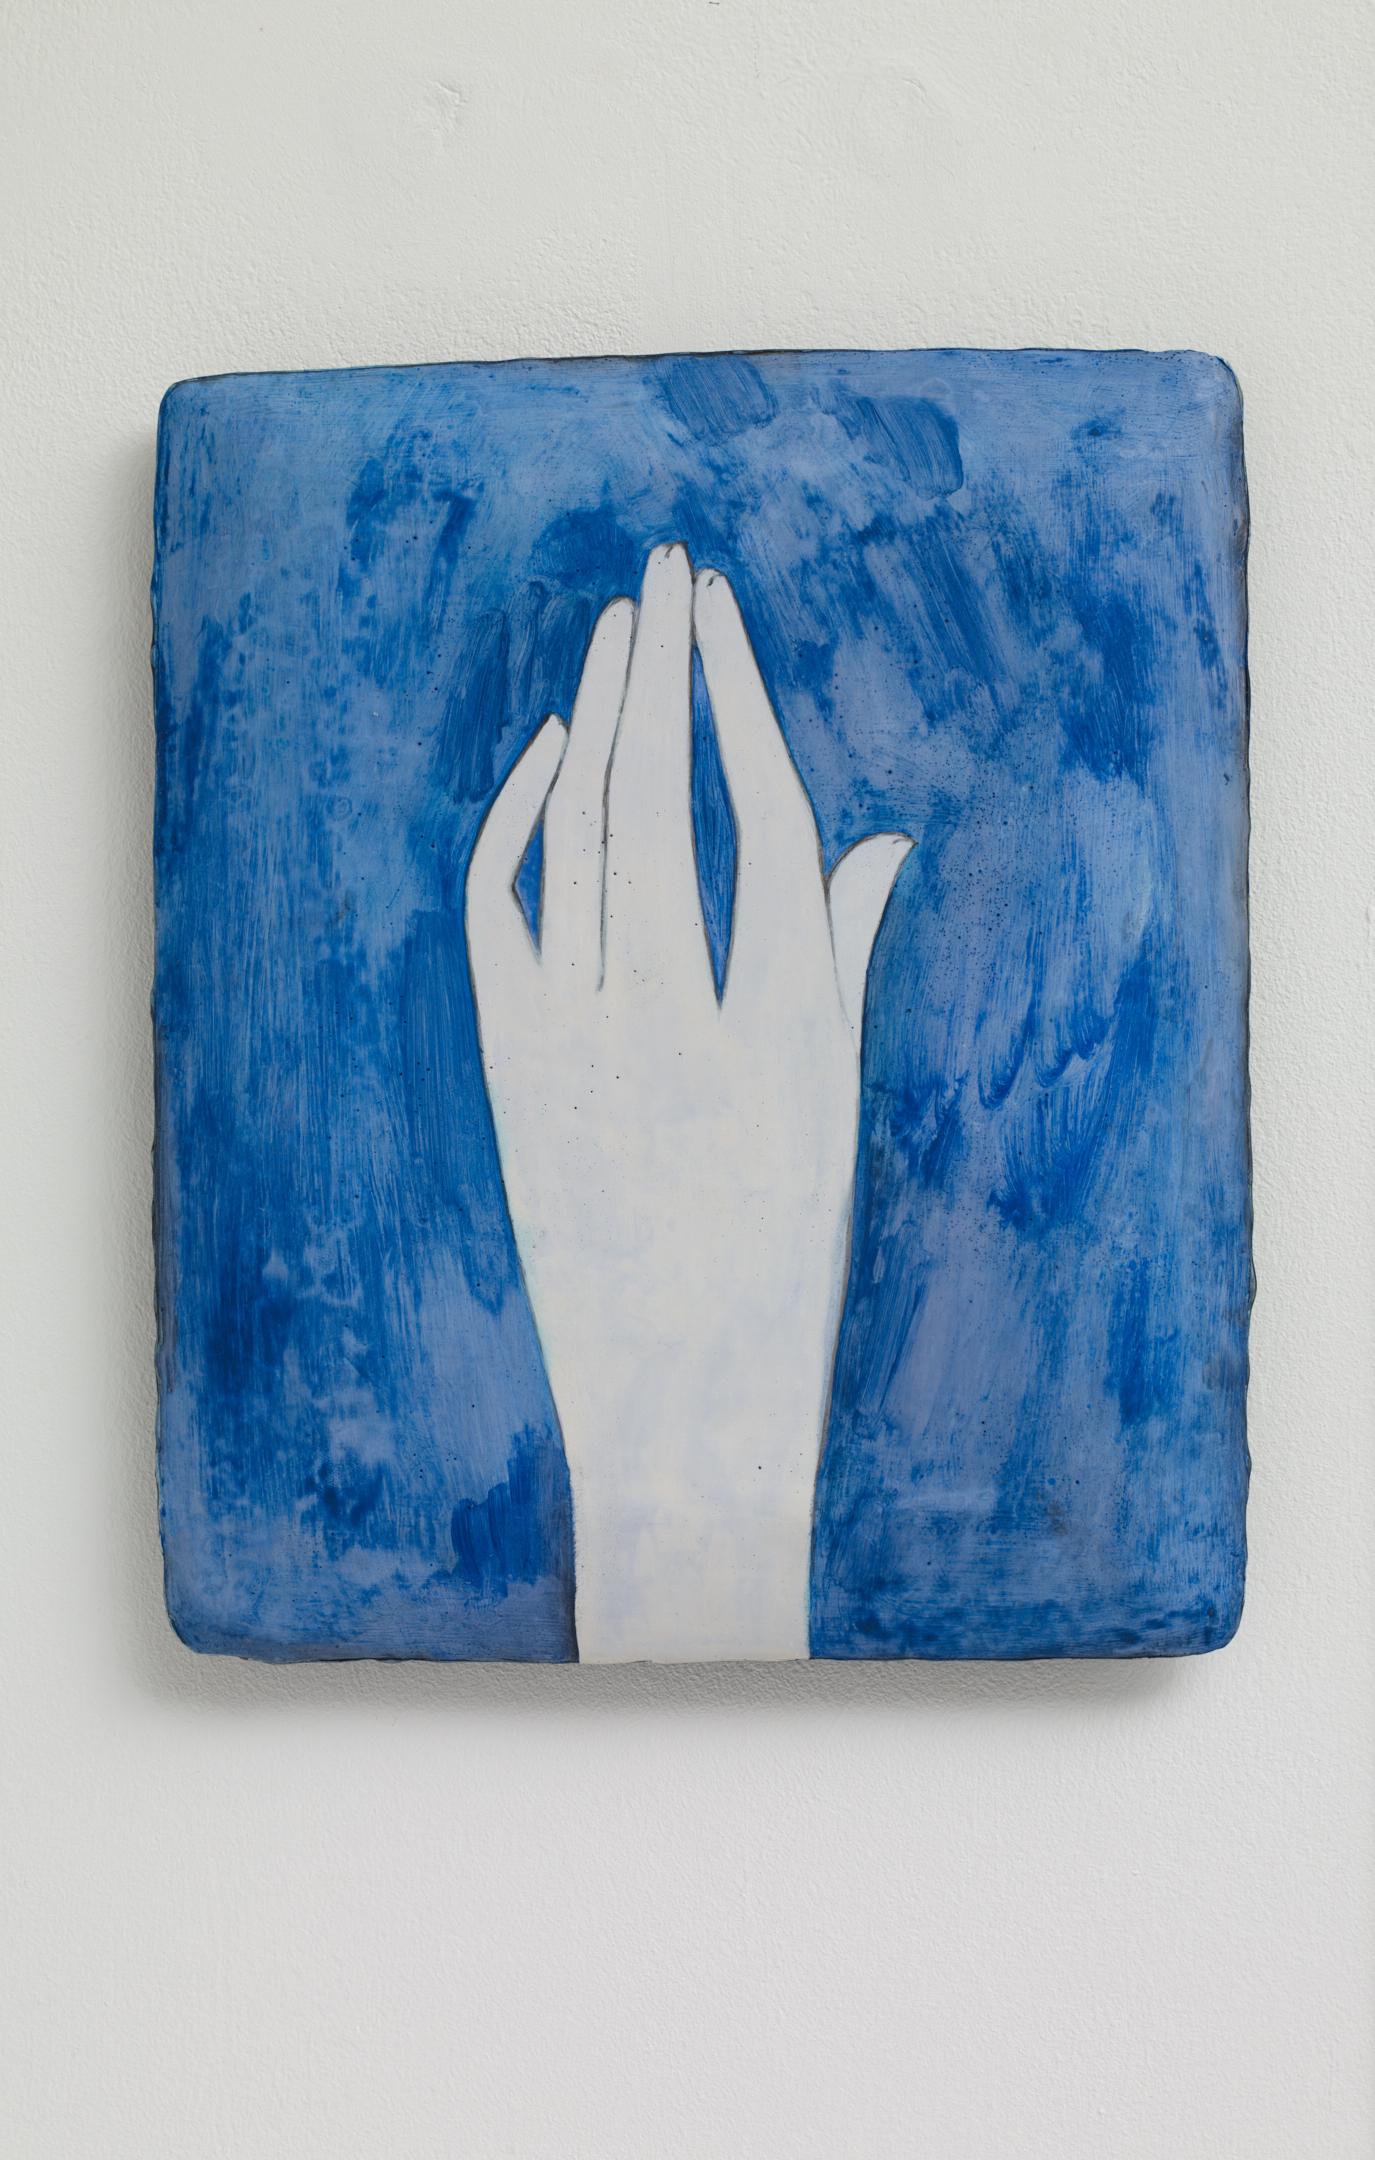 Nina Royle  Lazuli , 2019 Genuine ultramarine (lazurite), linseed oil and gesso on a shaped wood panel 23 x 19 cm